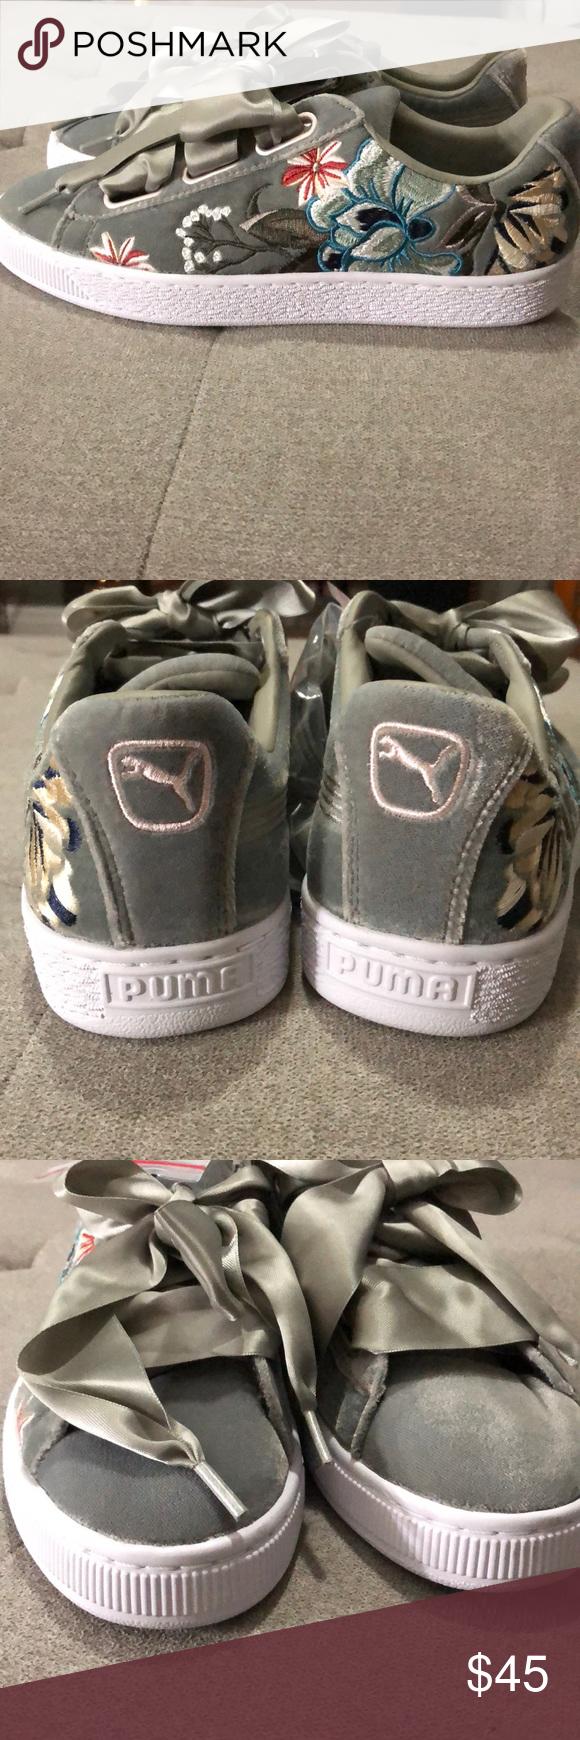 Puma basket heart, Pumas shoes